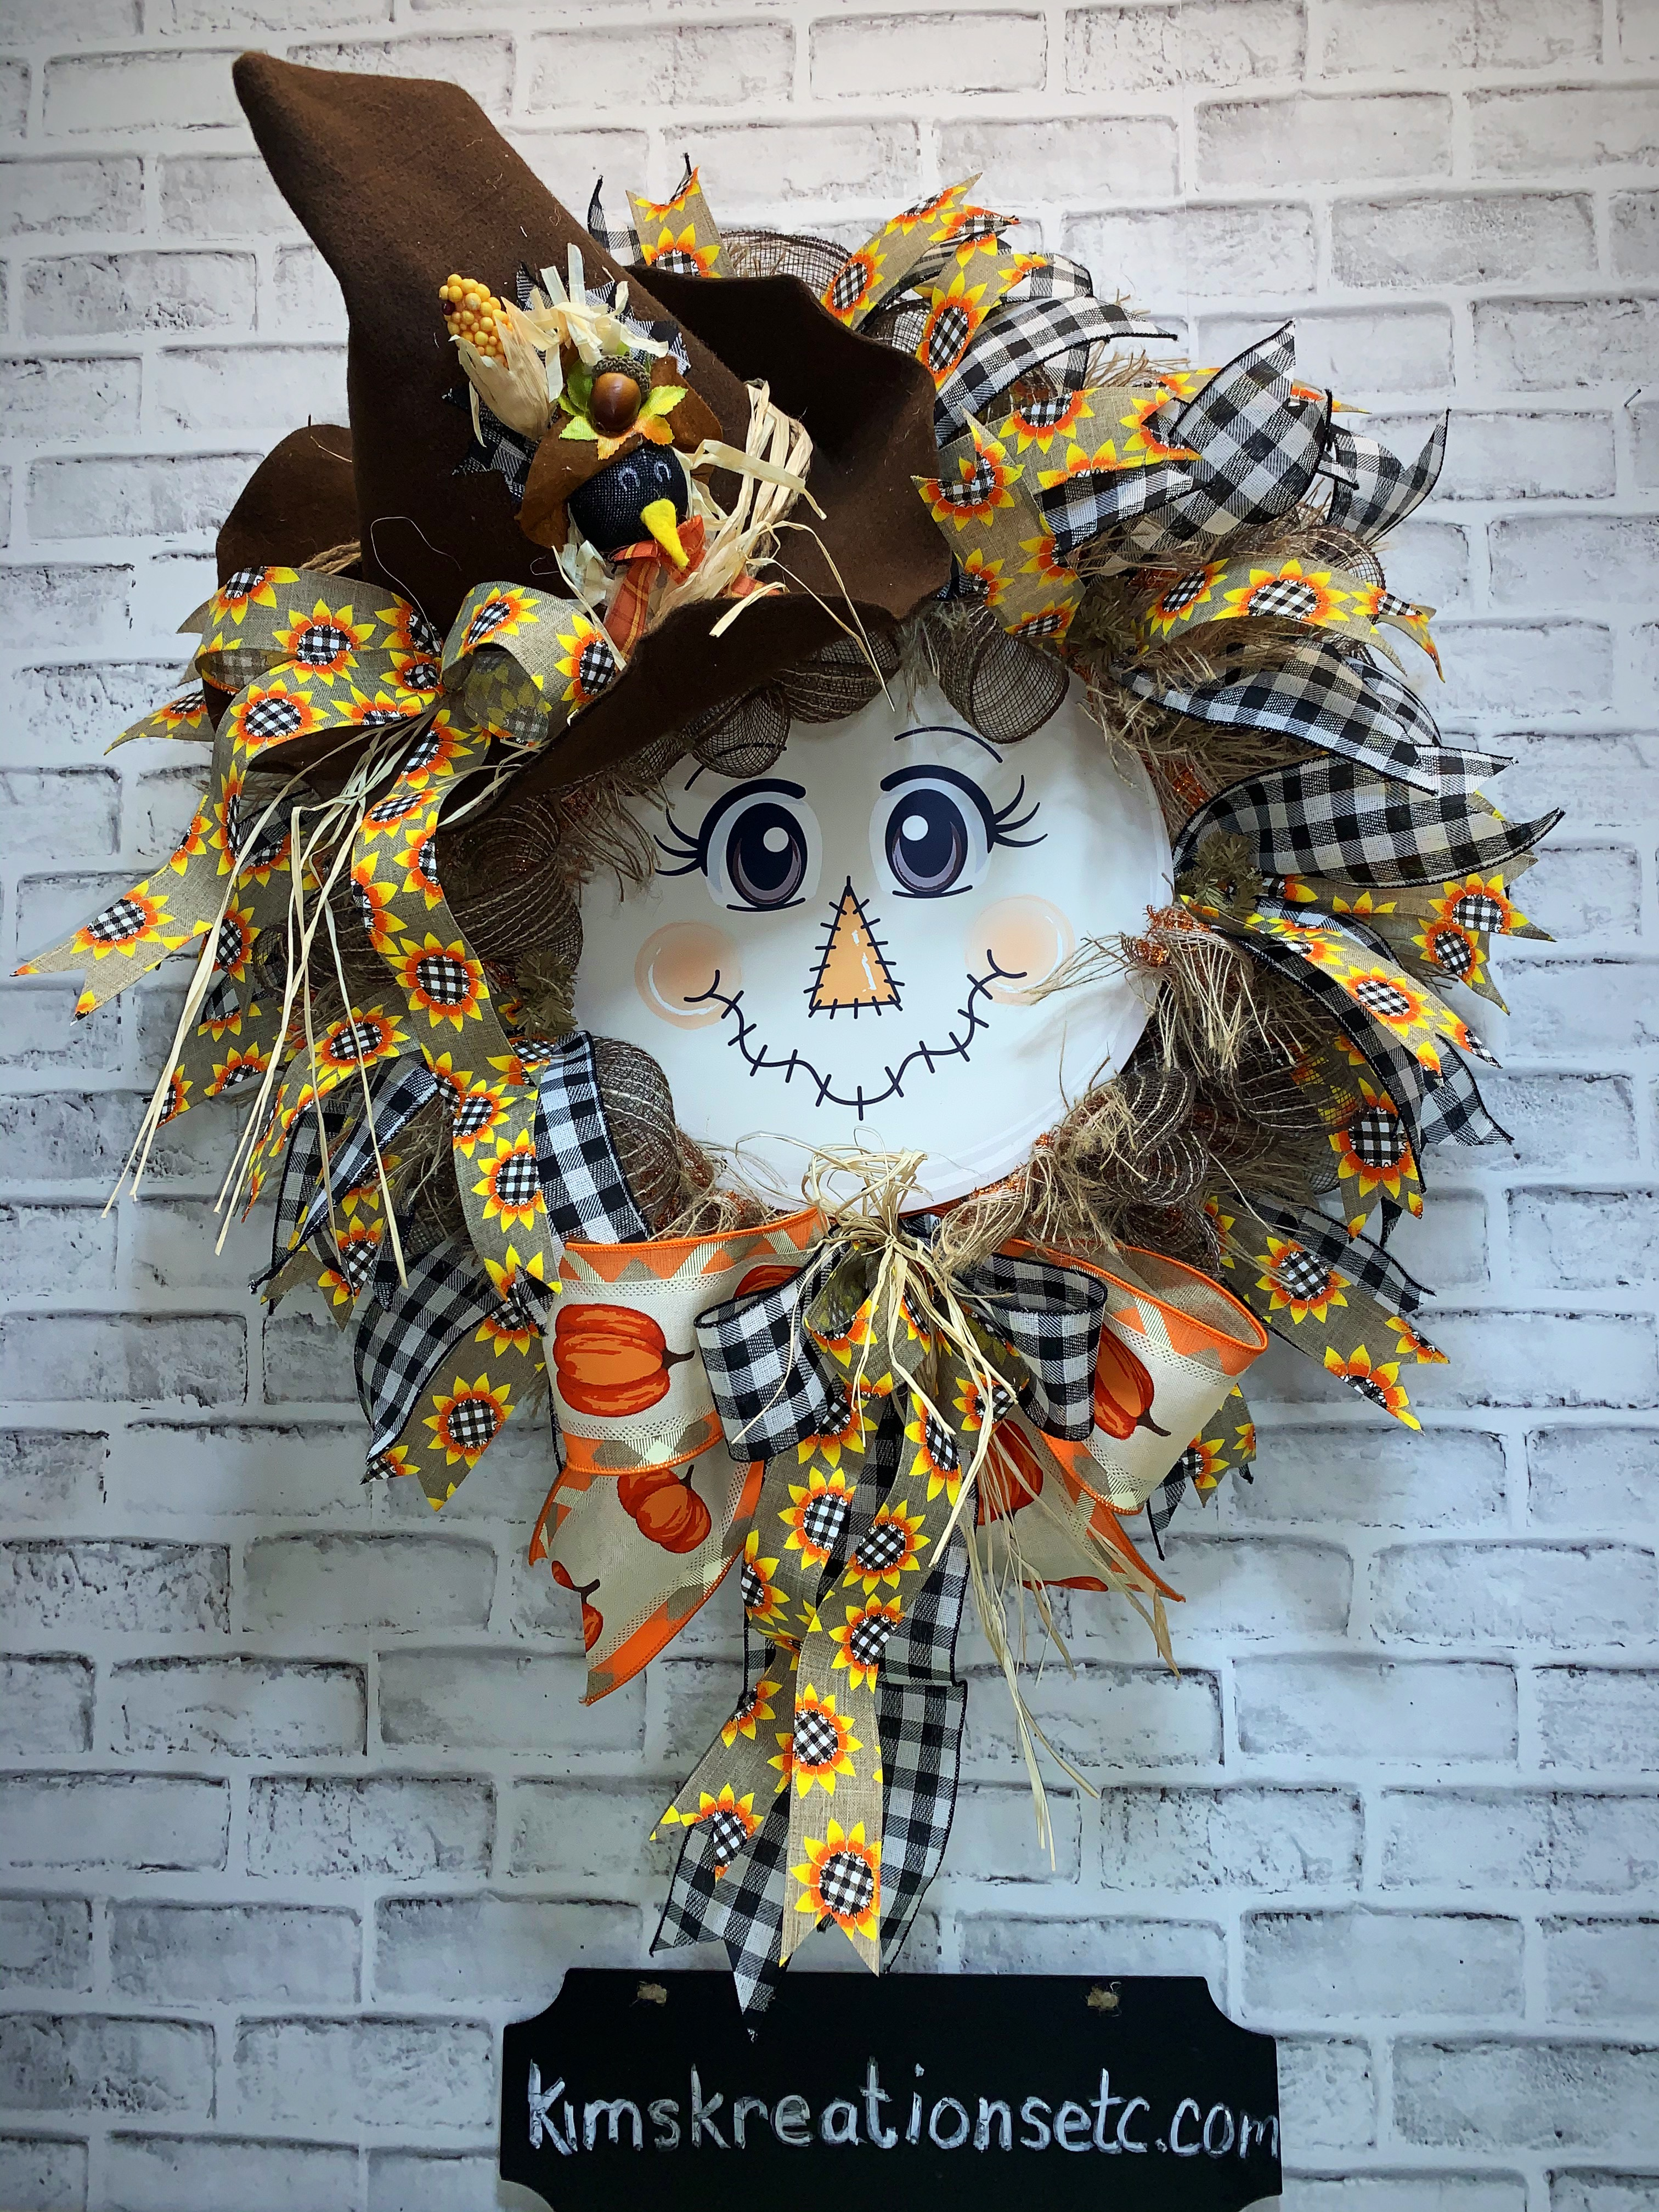 Fall Wreath Free Shipping Scarecrow Wreath Fall Scarecrow Scarecrow Face Fall Door Wreath Front Door Wreath For Fall Scarecrow Fall Decor Home Decor Decorative Wreath For Fall Wreaths For Sale Kim S